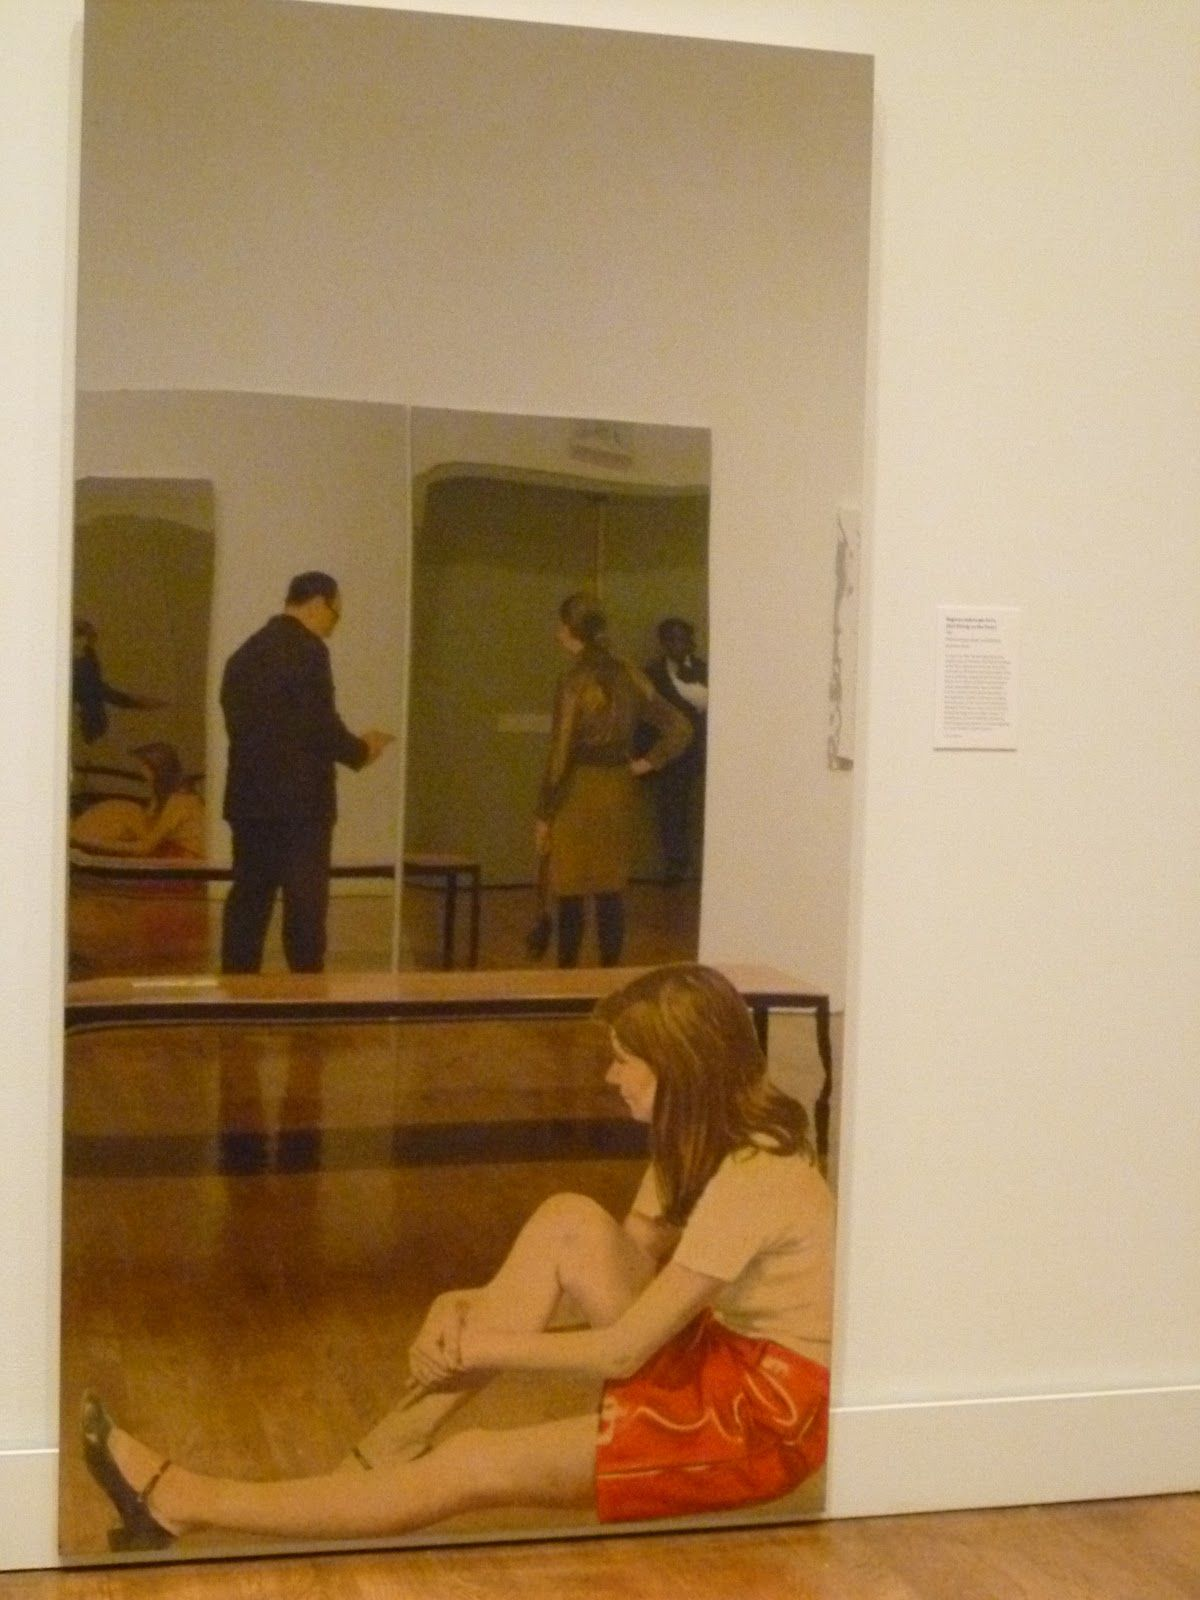 Michelangelo Pistoletto, Mirror Paintings